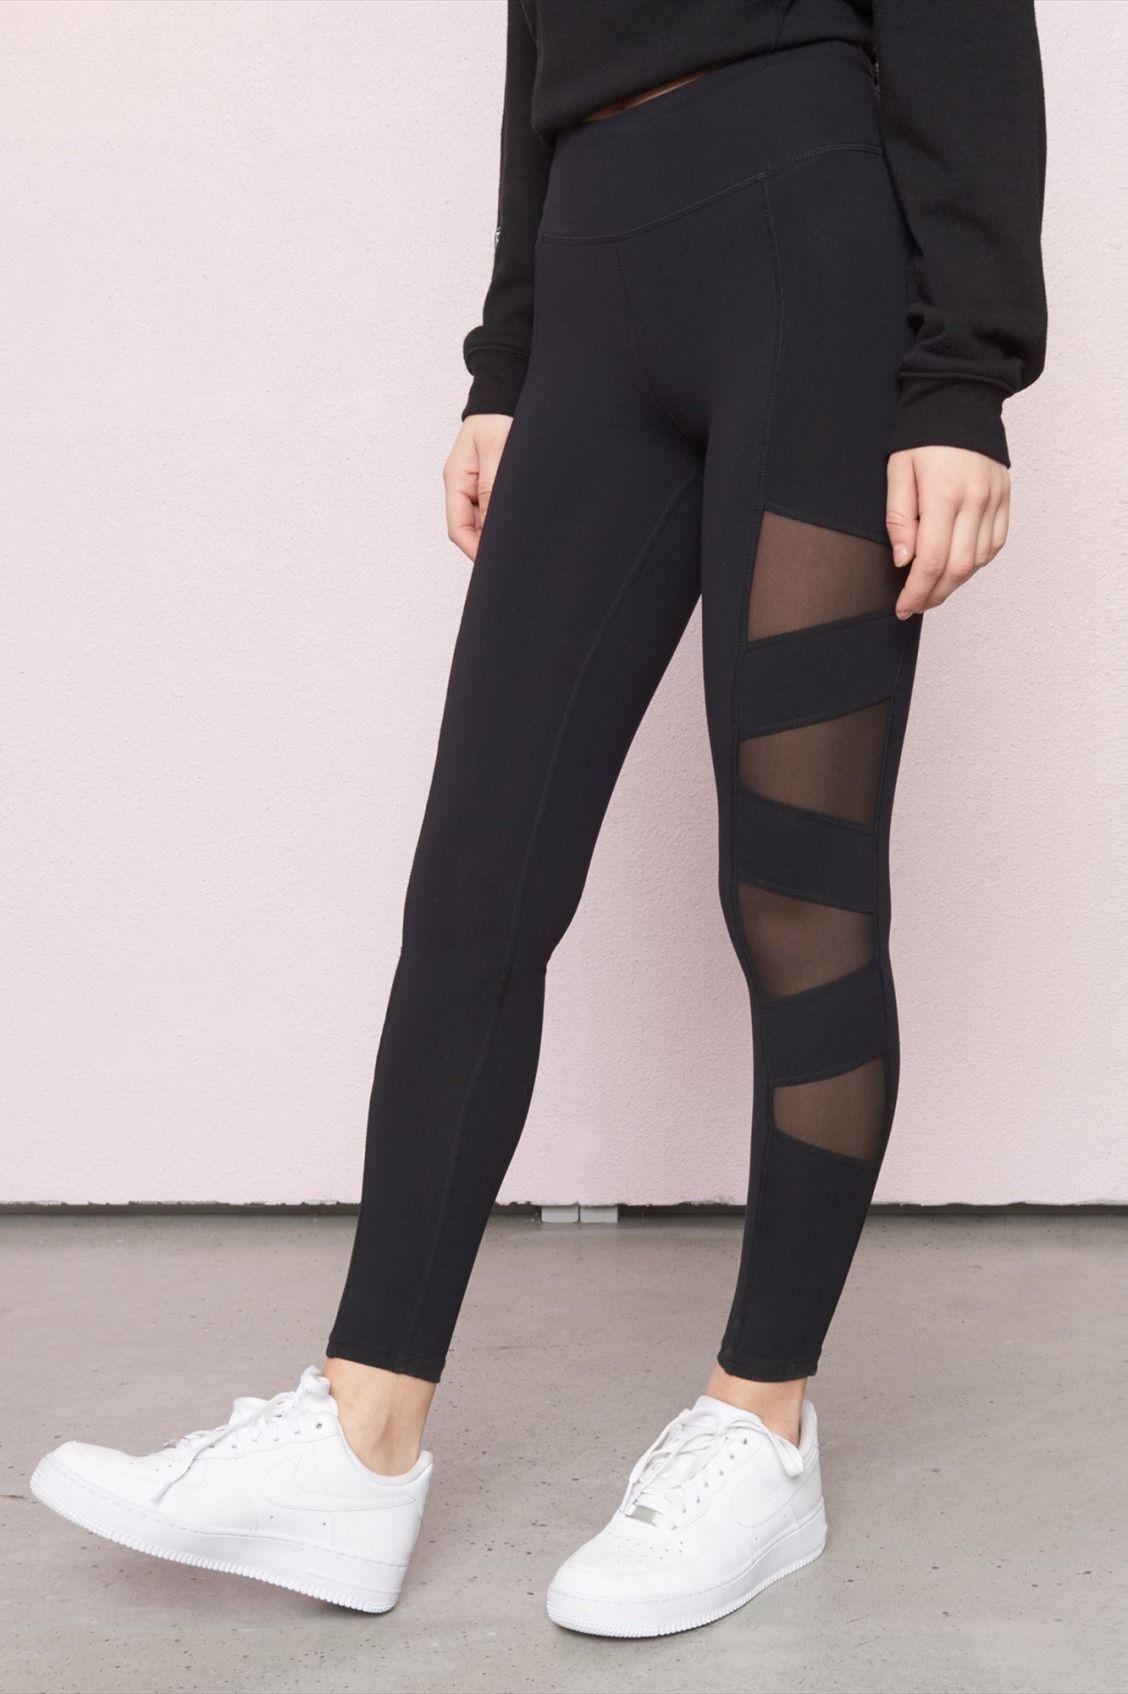 f0fbe948272913 Online Shopping Ladies Dress | Woodward Clothing | Mesh leggings ...